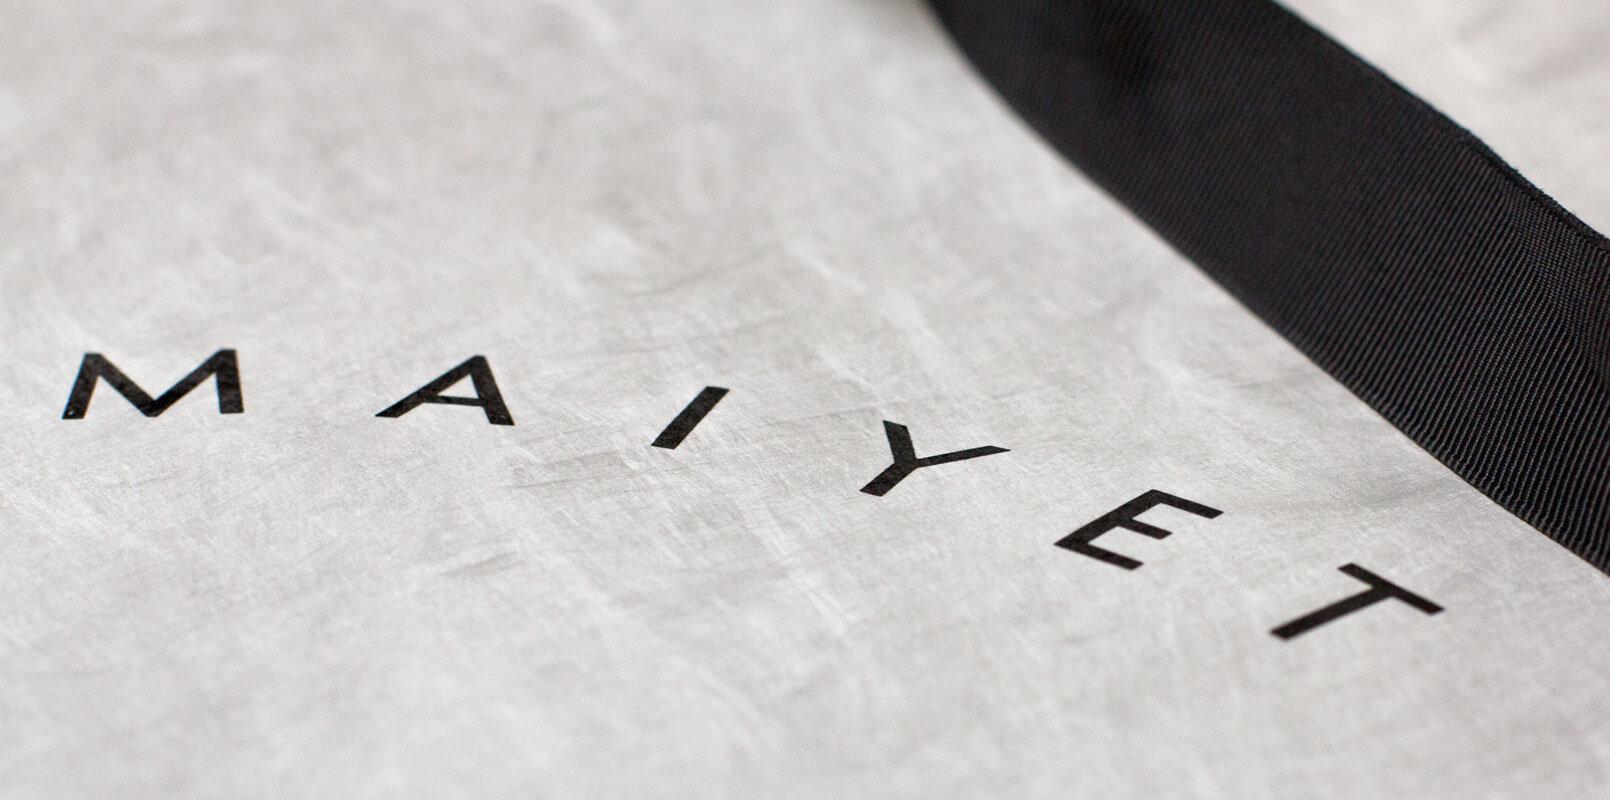 Maiyet-Shopping-Bag-Design-Packaging-Company-3.jpg